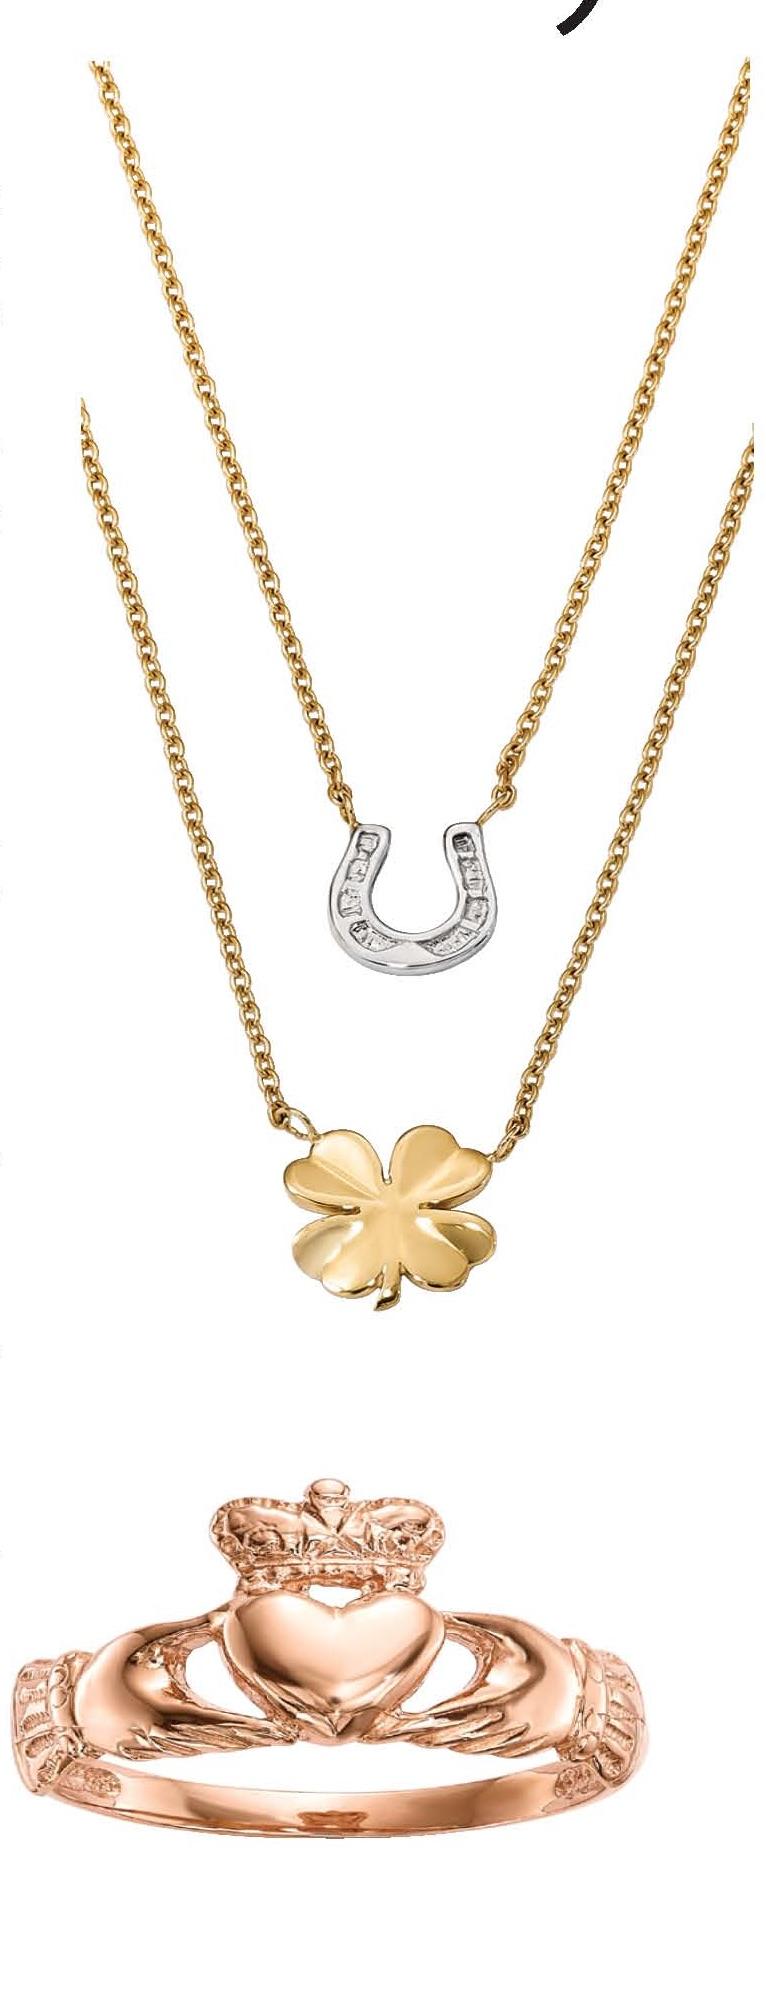 Houston Jewelry - Houston's Most Trusted Jeweler